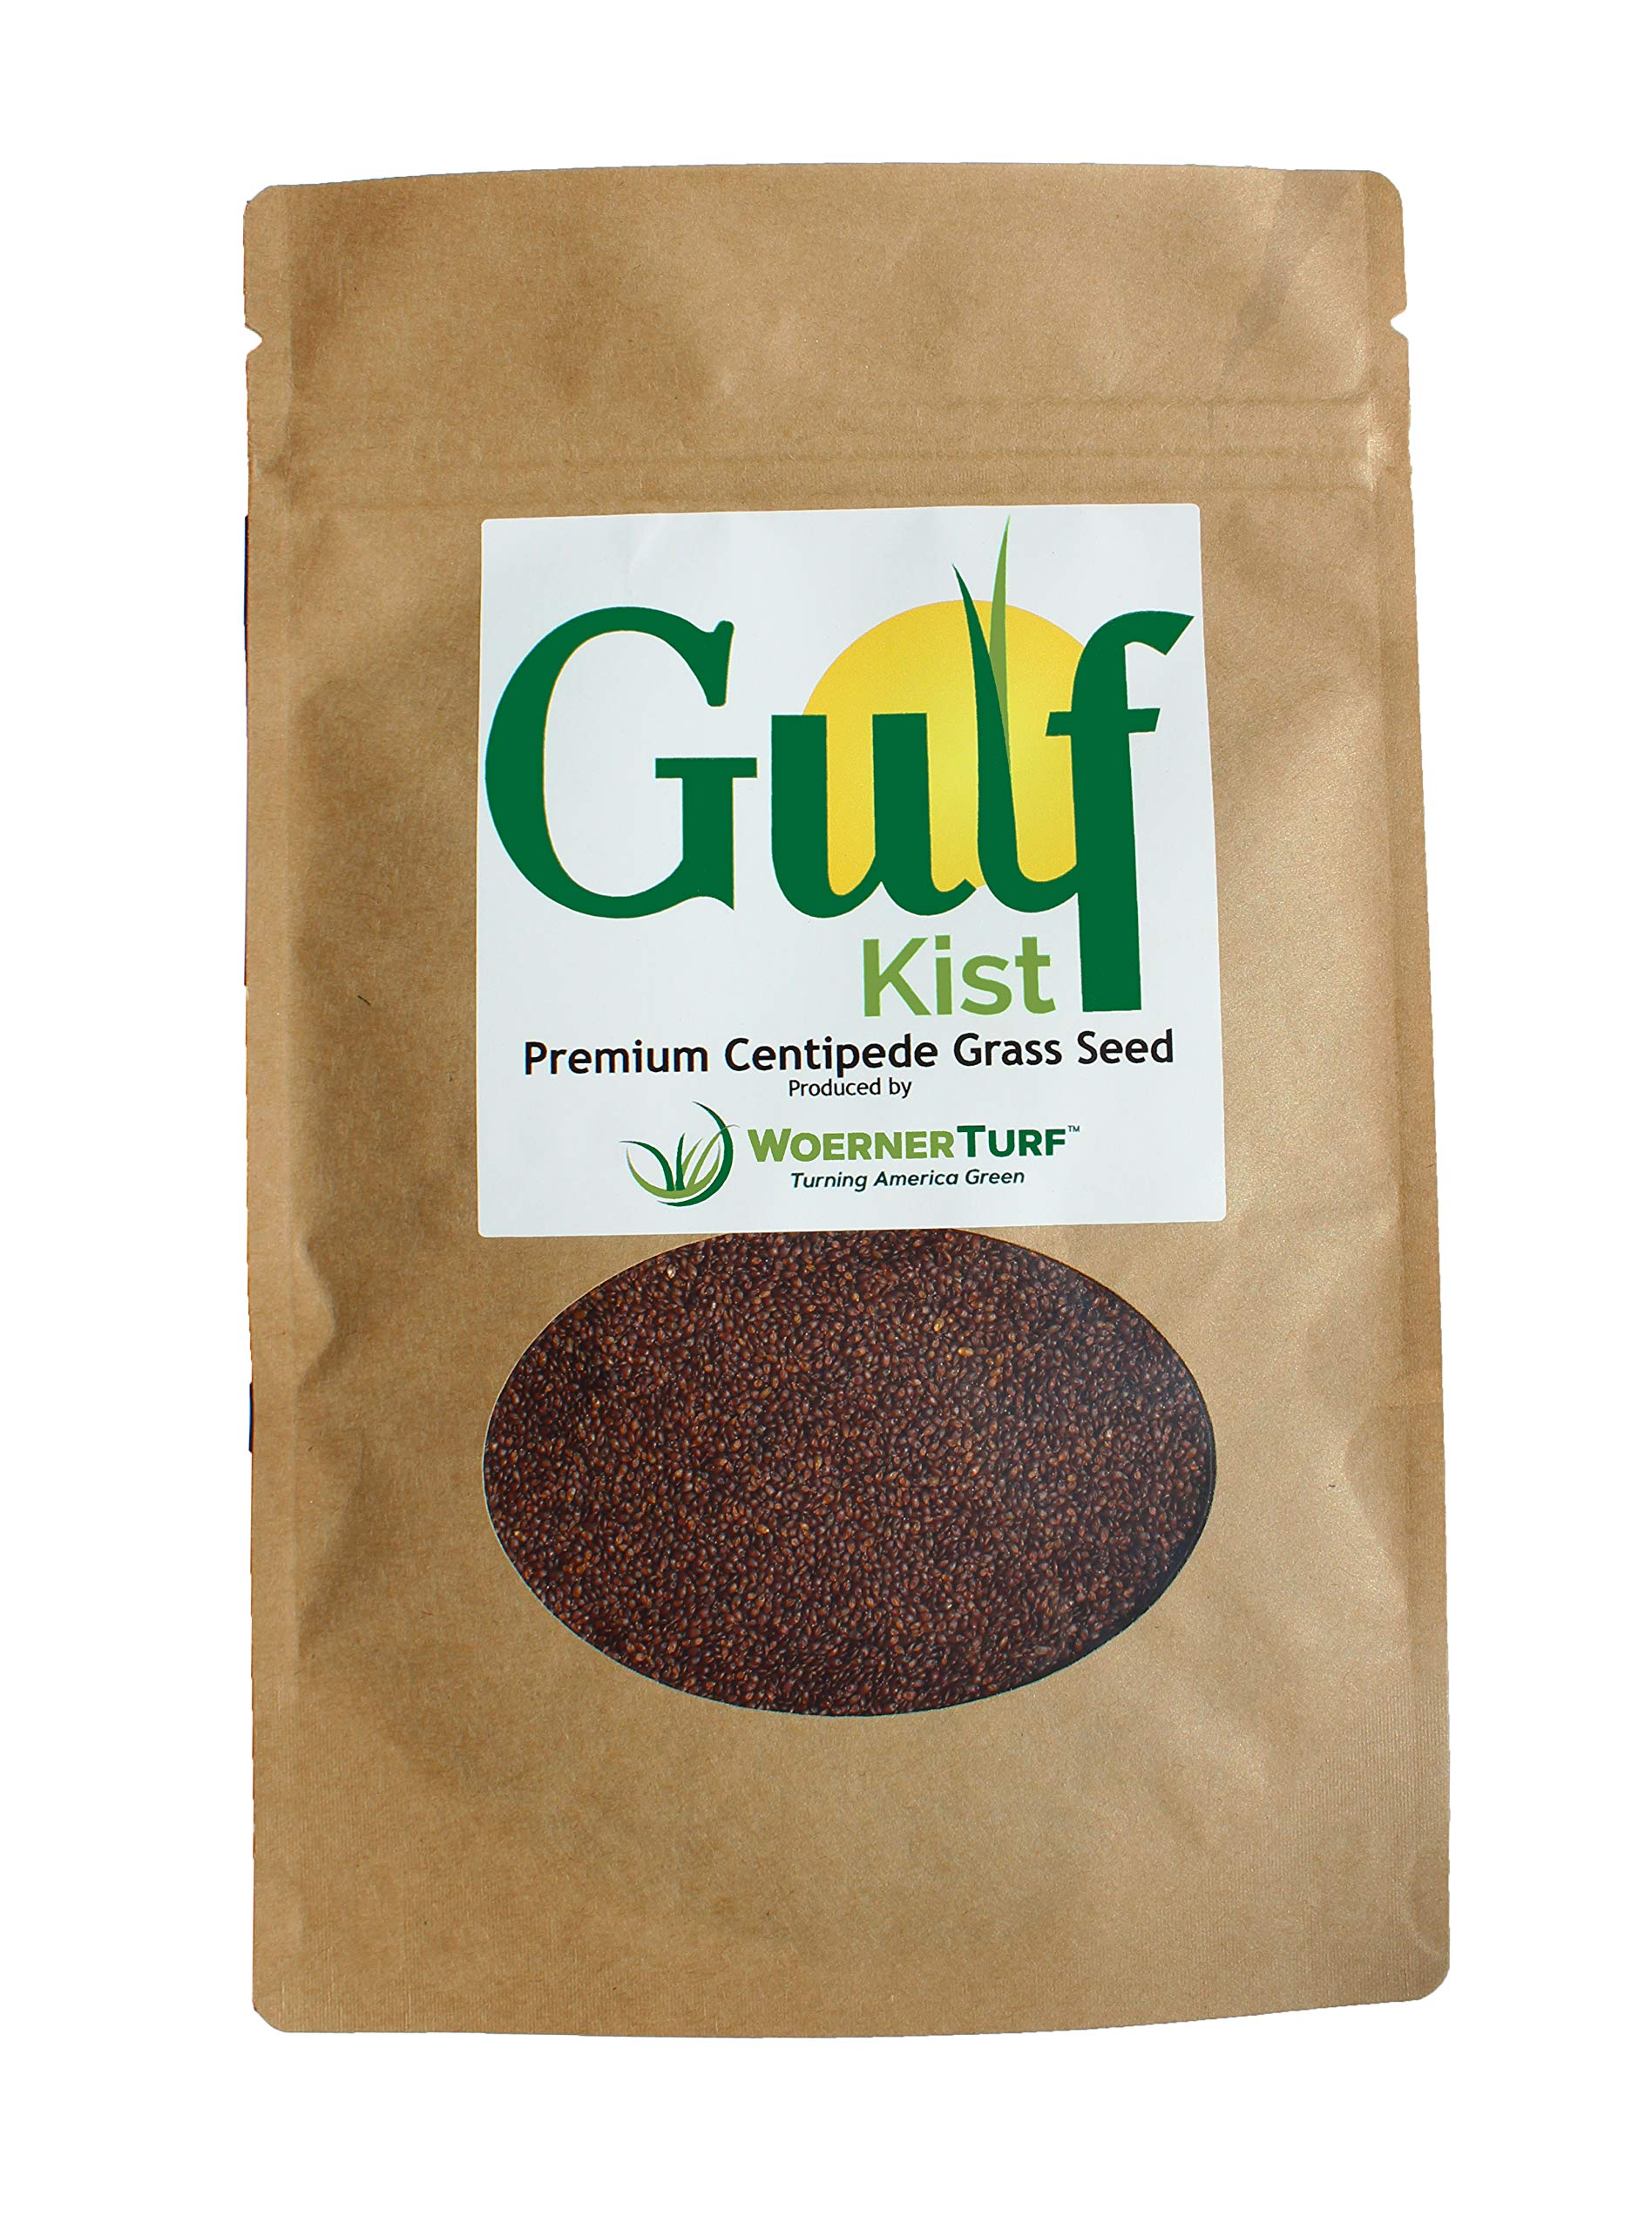 Gulf Kist Centipede Grass Seed Raw (1lb) by Gulf Kist (Image #1)